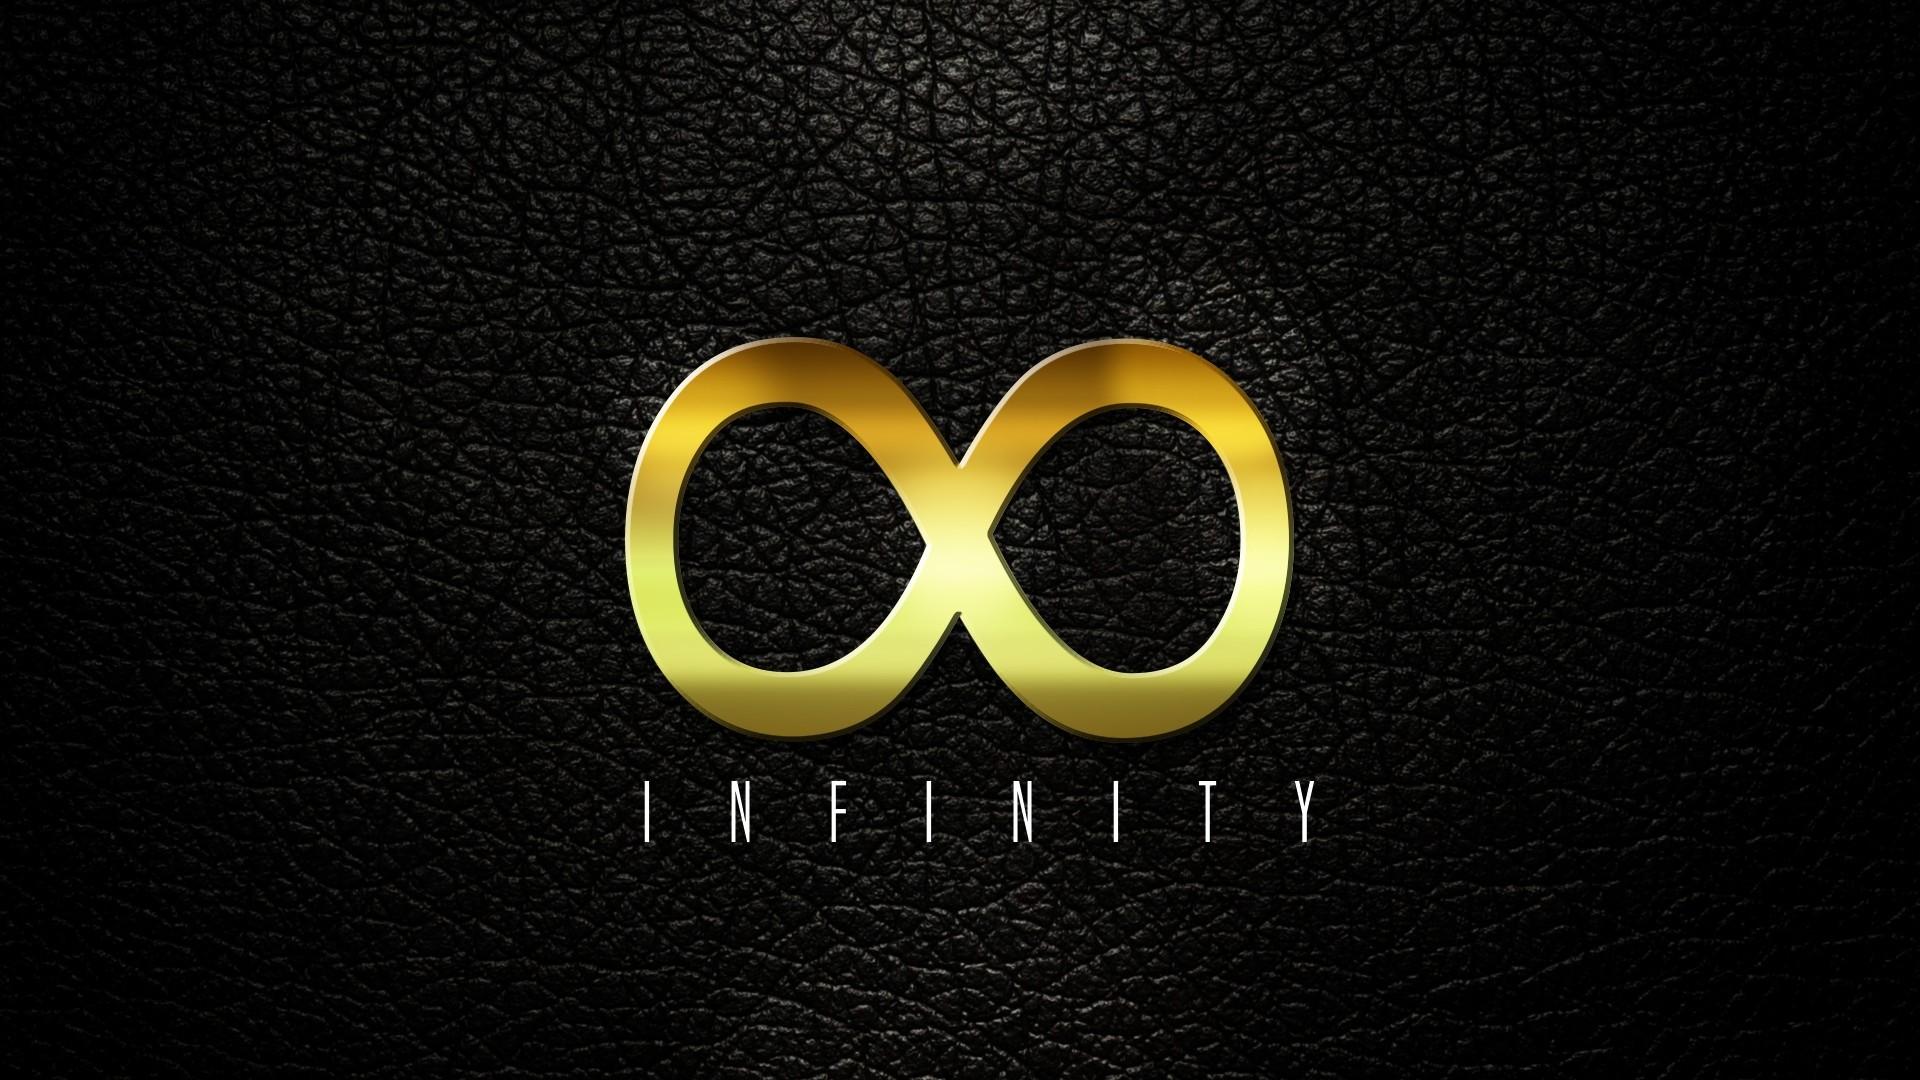 Infinity PC Wallpaper